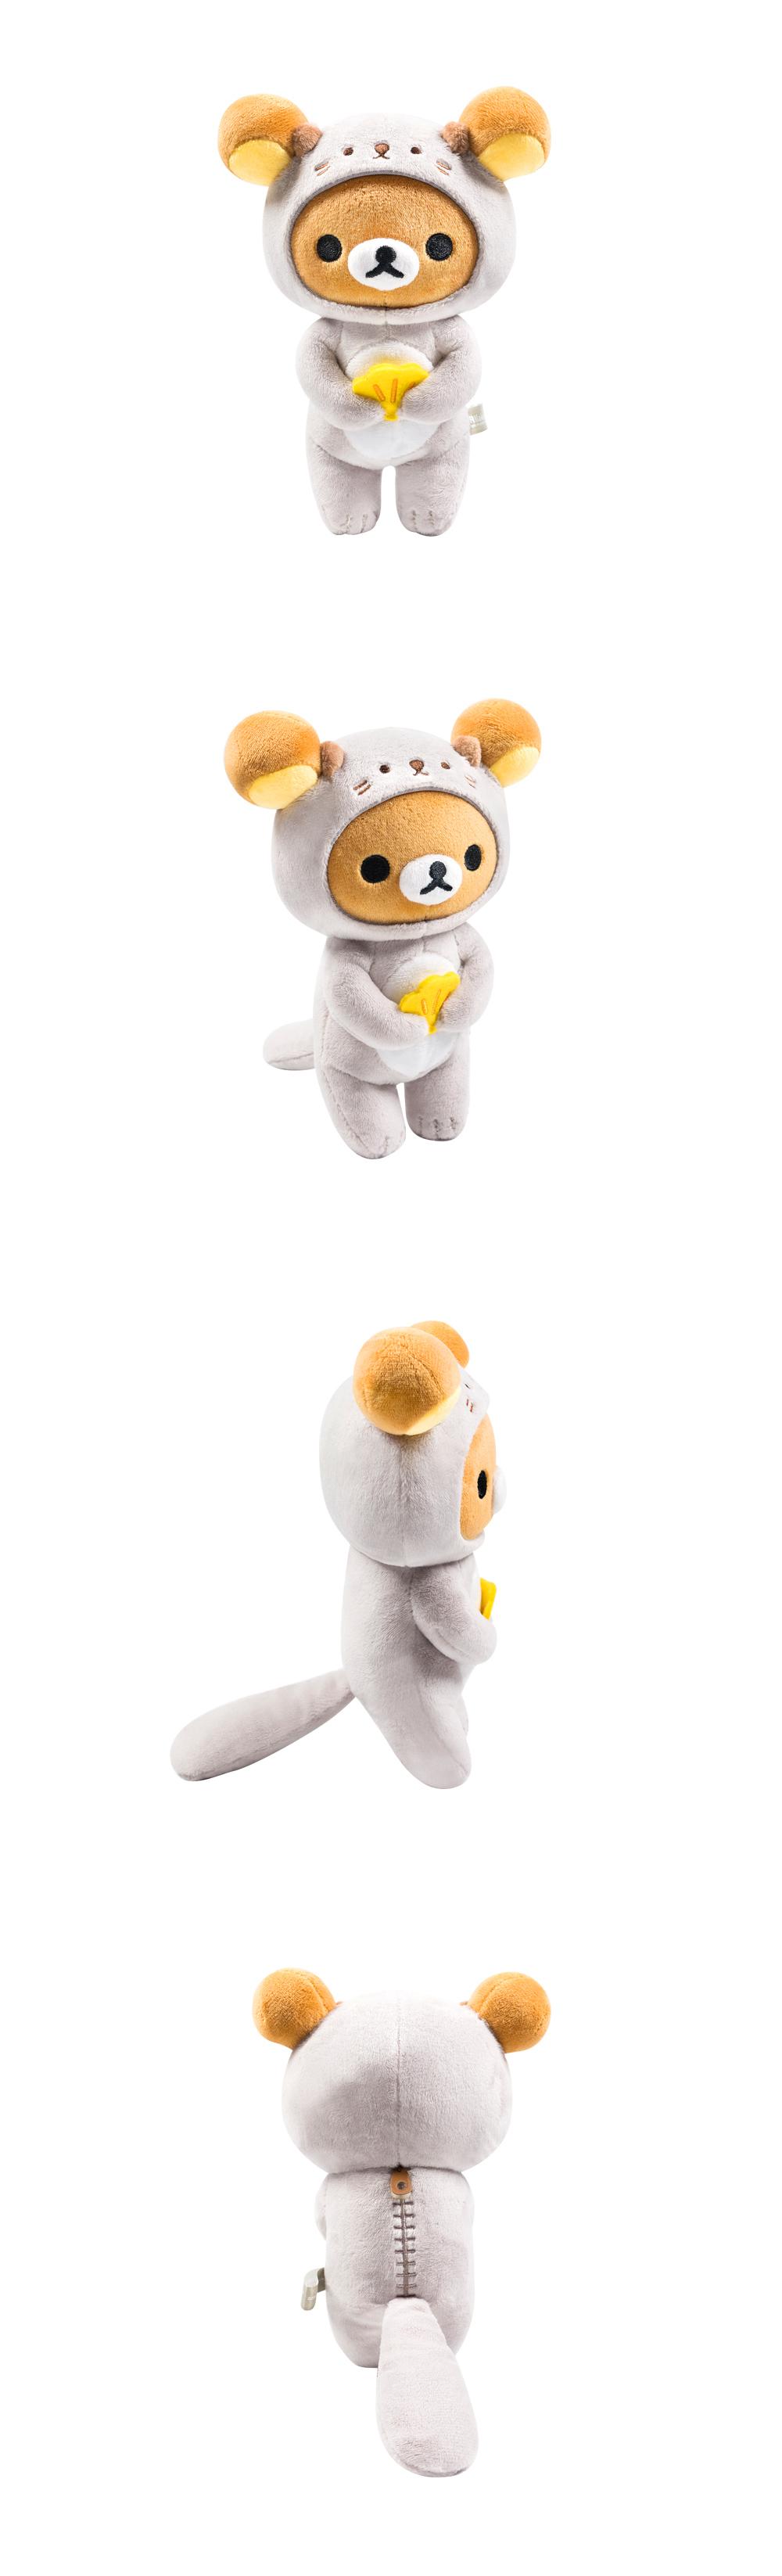 拉拉熊 海獺款15公分(咖啡)【RK1601010202】